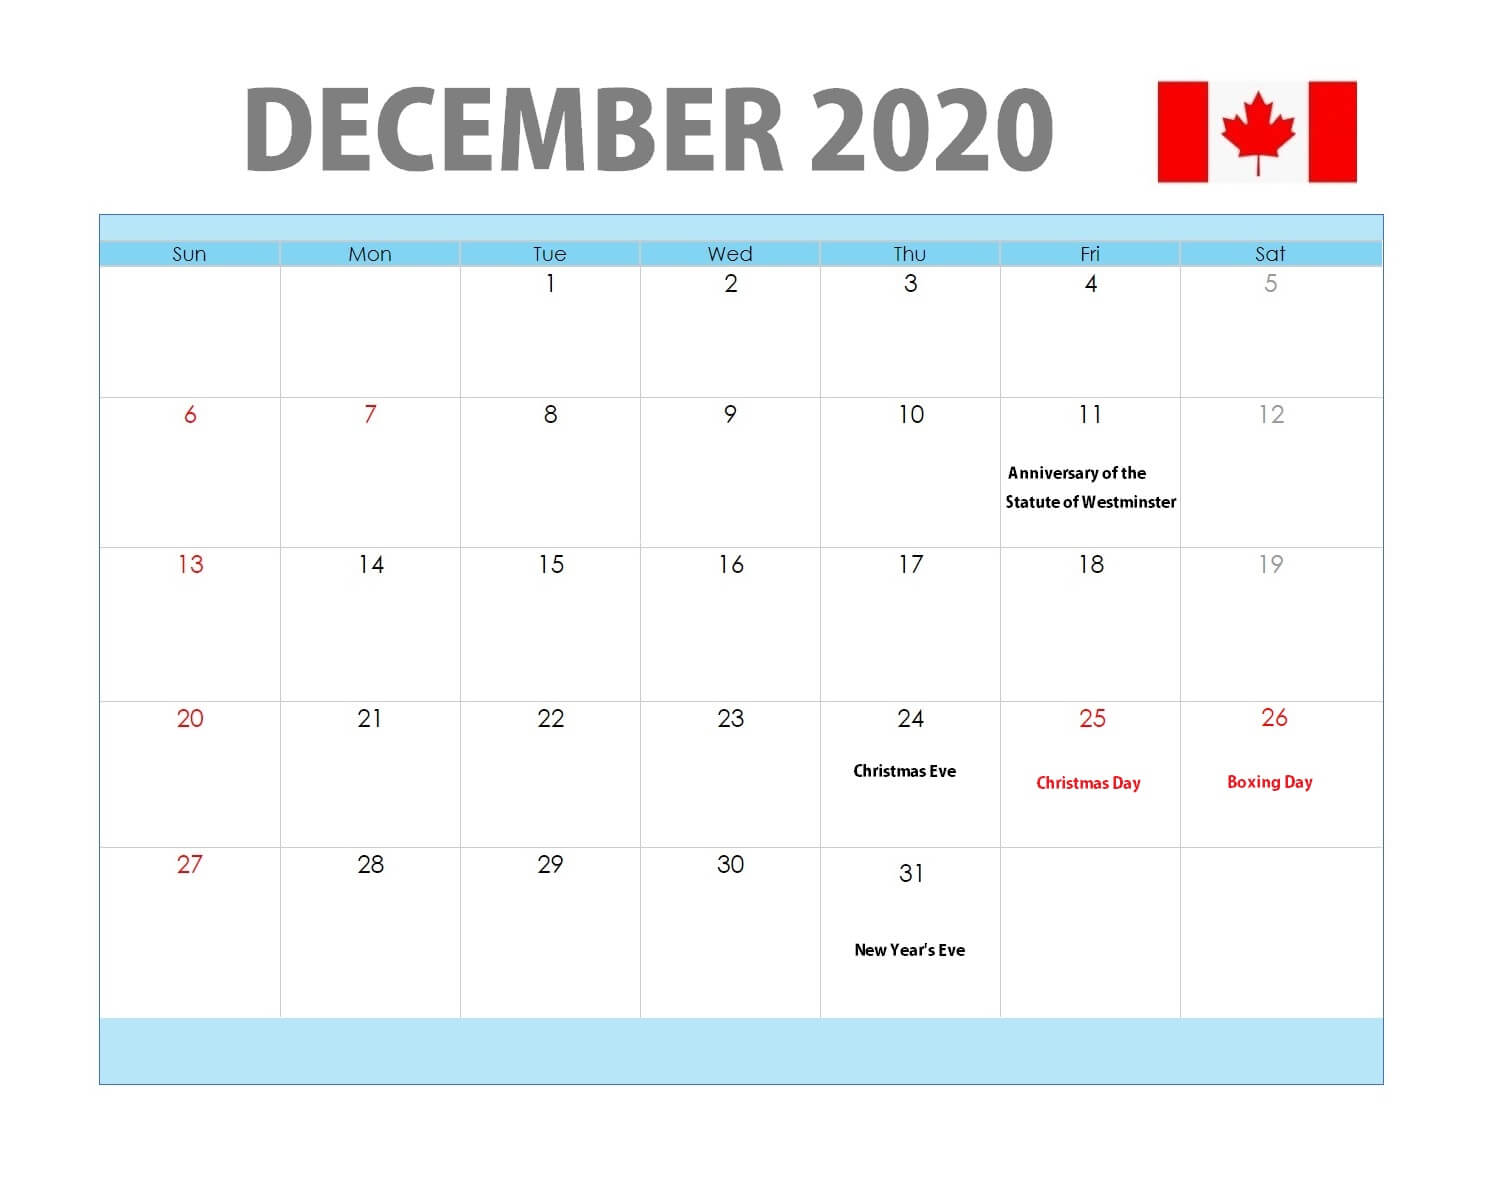 December 2020 Calendar with Holidays Canada